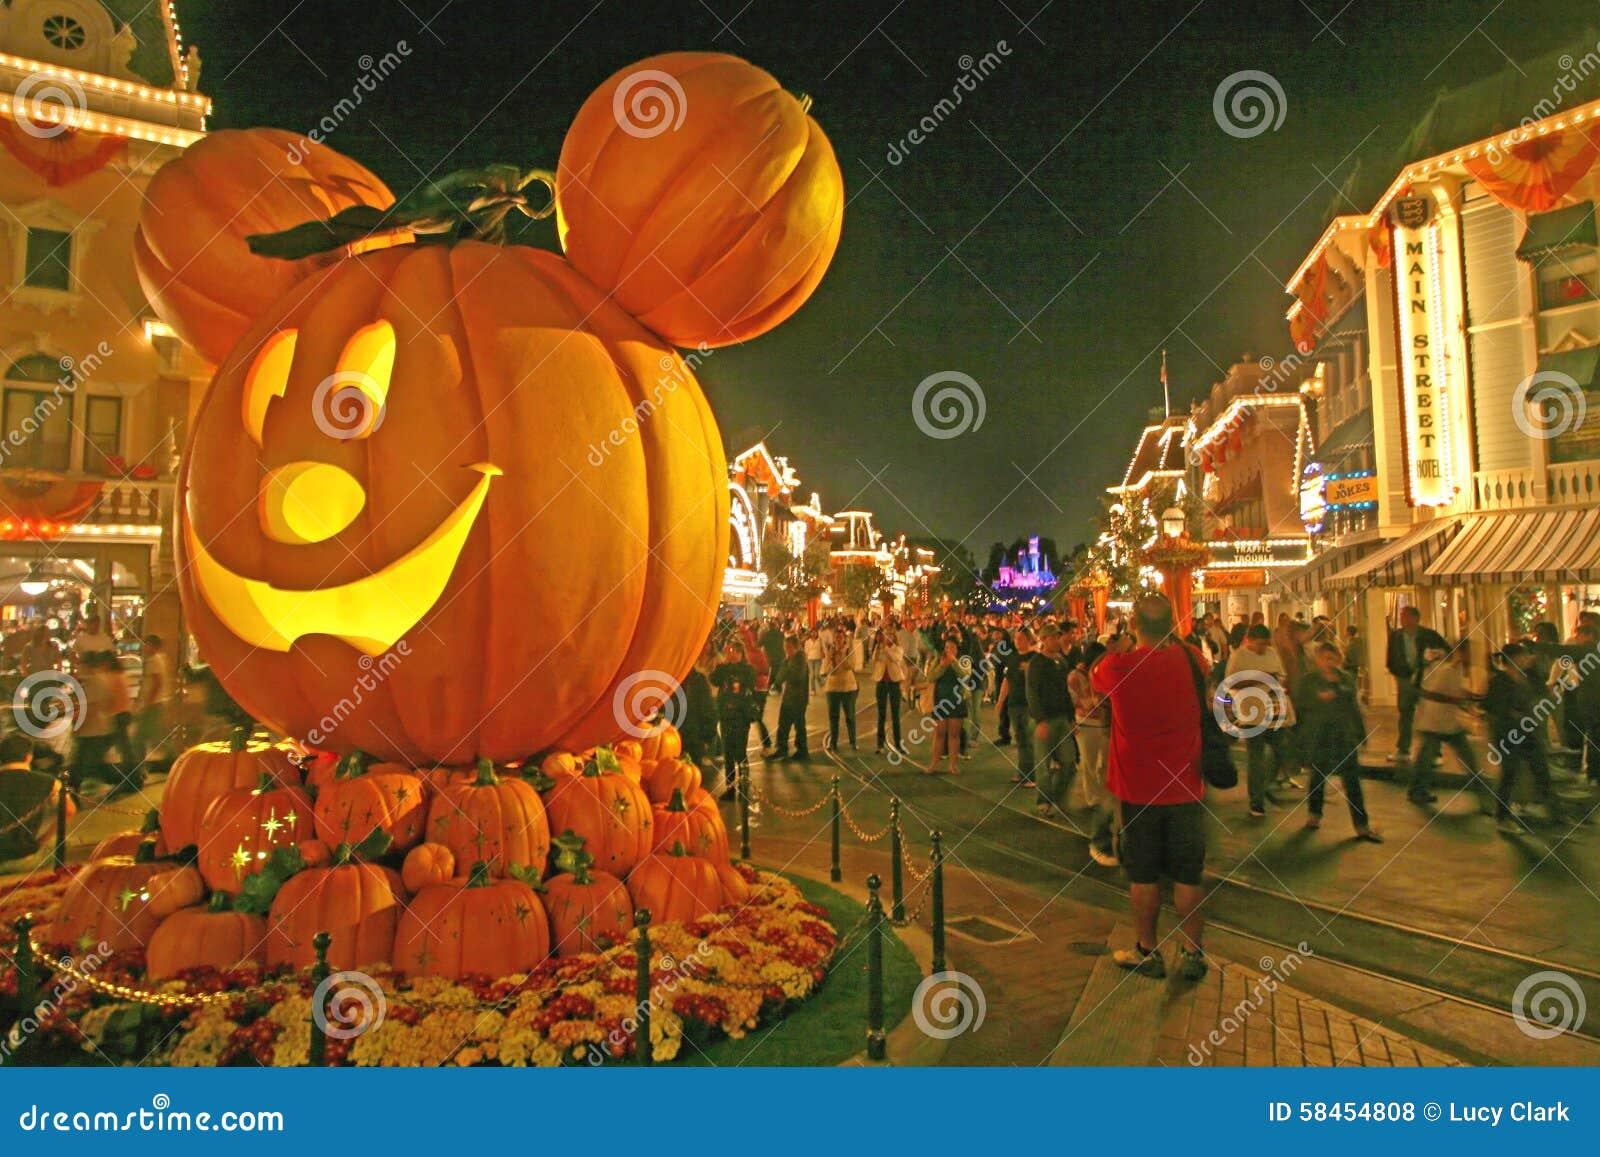 anaheim california disneyland halloween - Disneyland Hours Halloween